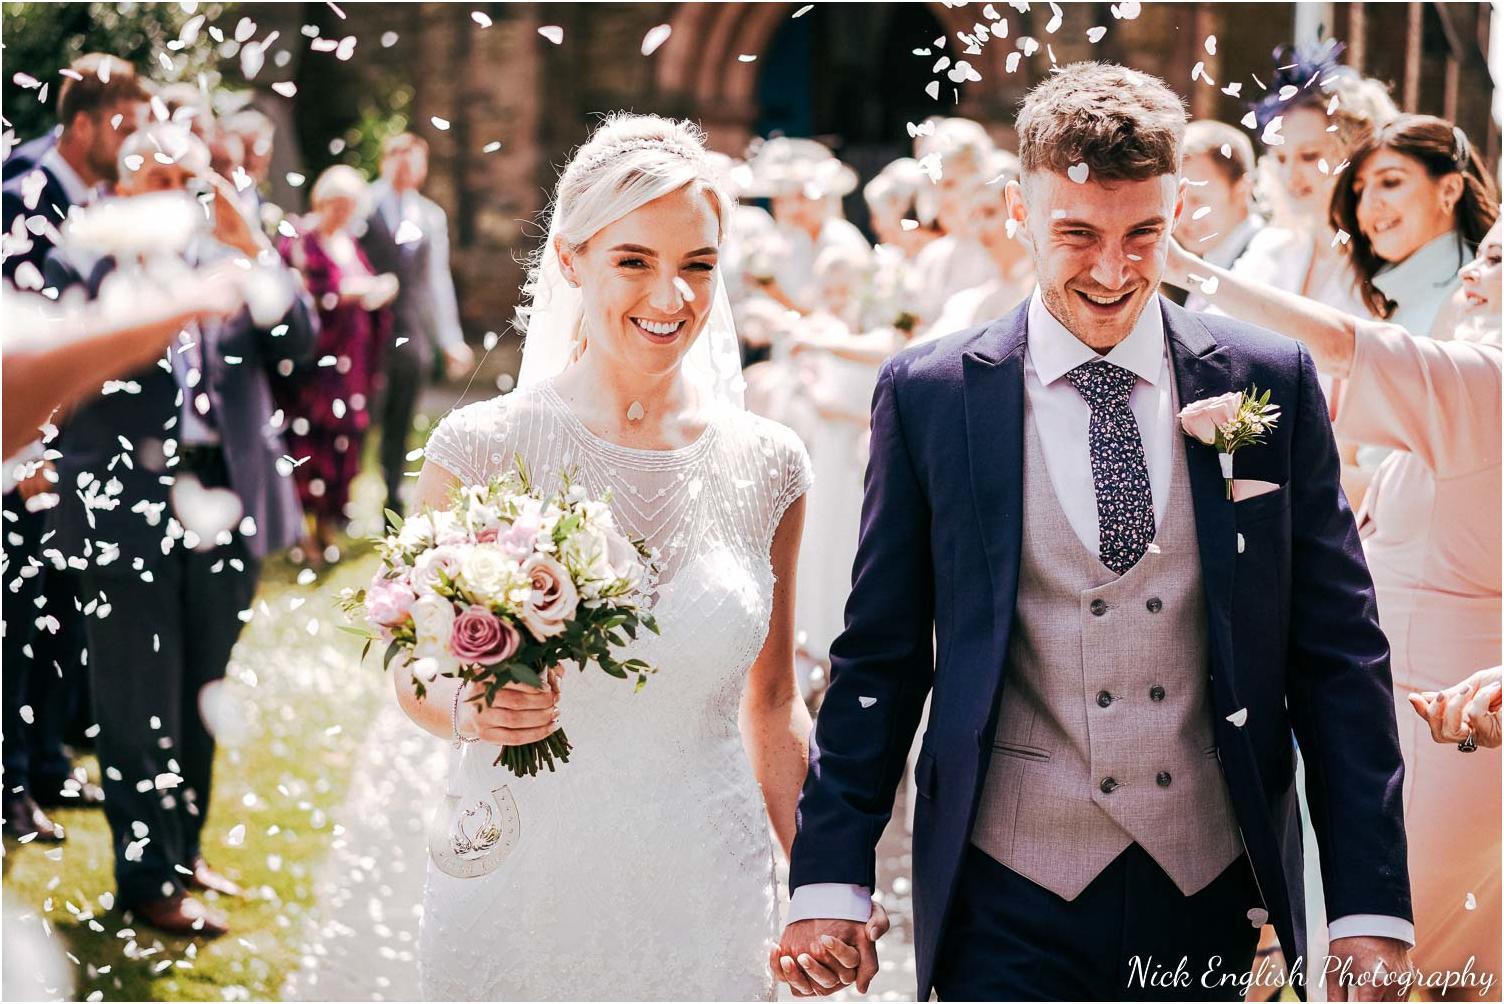 Mitton_Hall_Wedding_Photograph-55.jpg